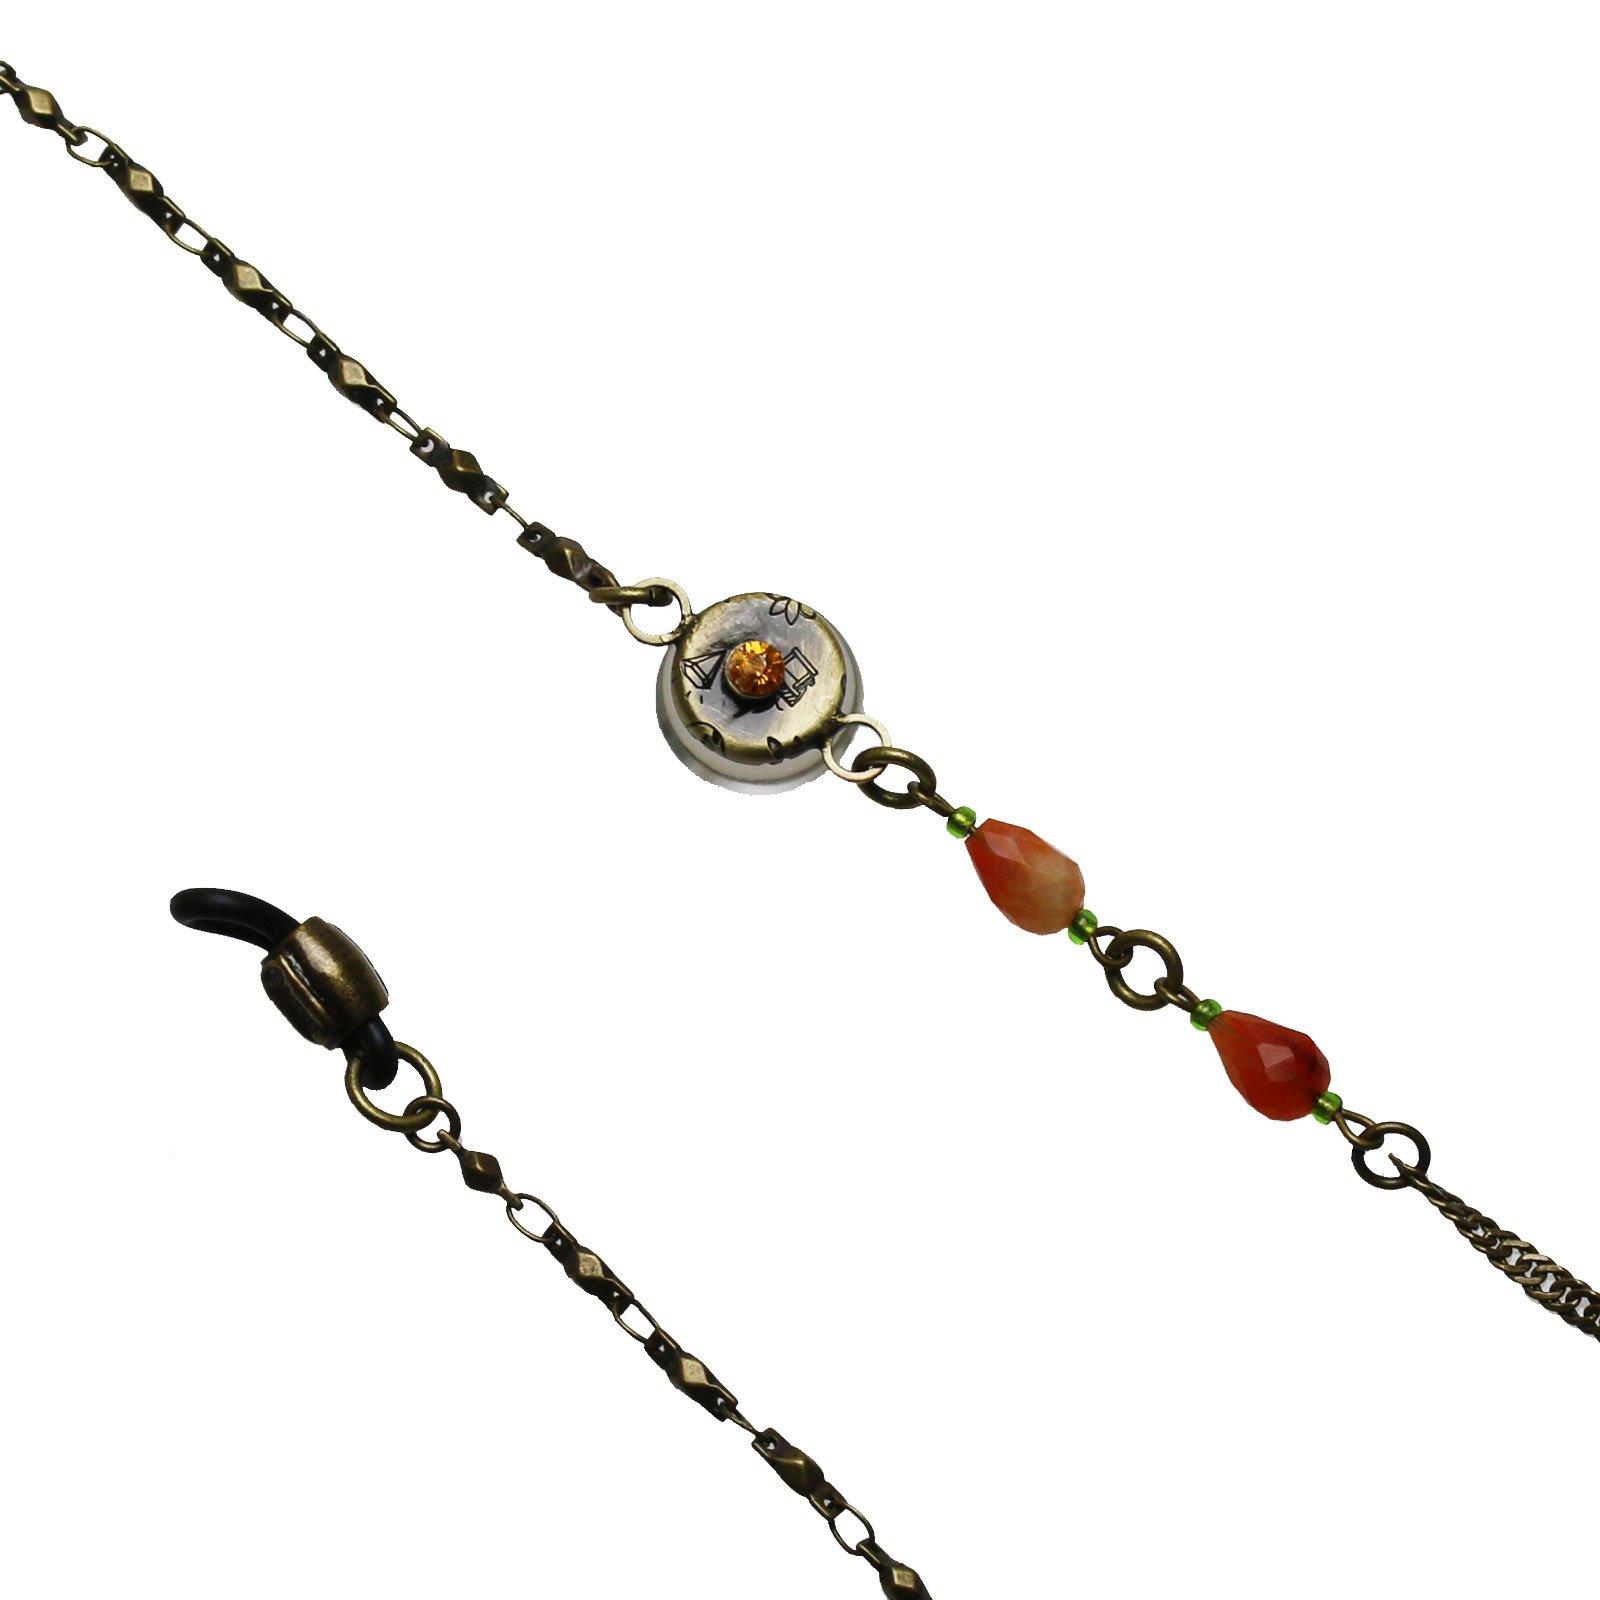 Tamarusan Glasses Chain Cicada Green Carnelian Glass Cord Handmade by TAMARUSAN (Image #3)